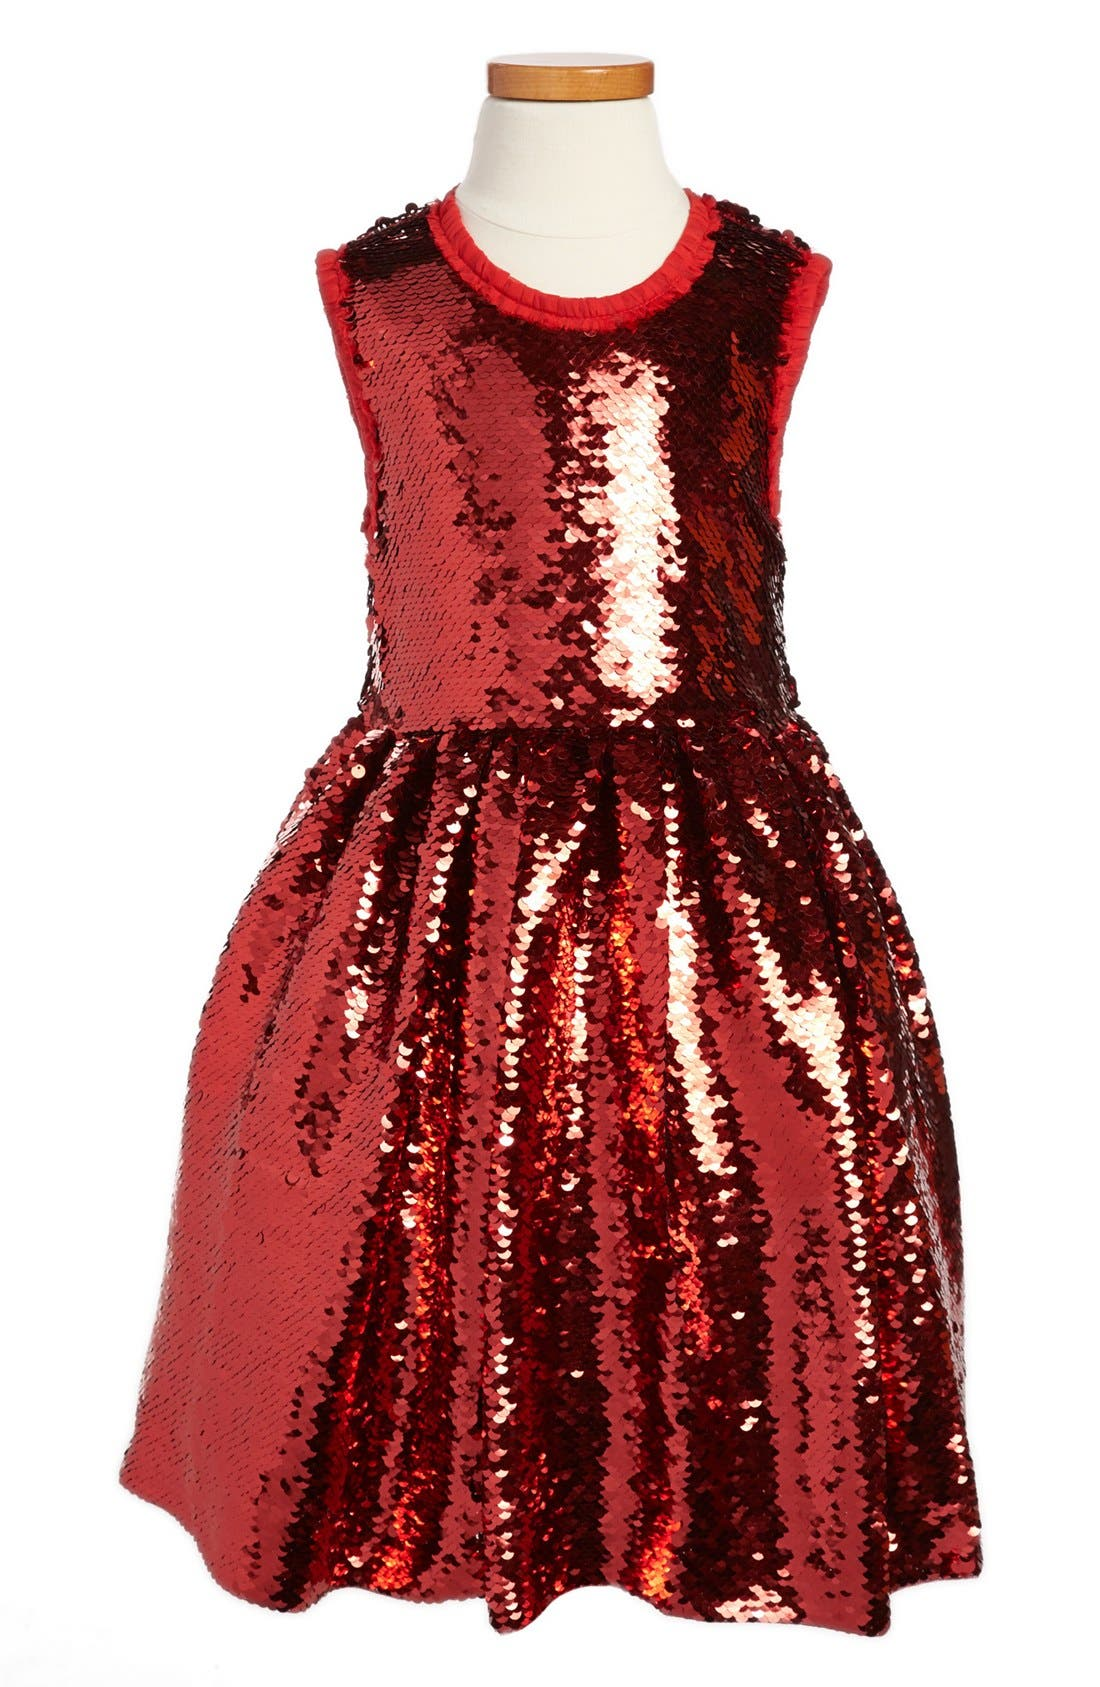 Alternate Image 1 Selected - Dolce&Gabbana Sleeveless Dress (Little Girls & Big Girls)